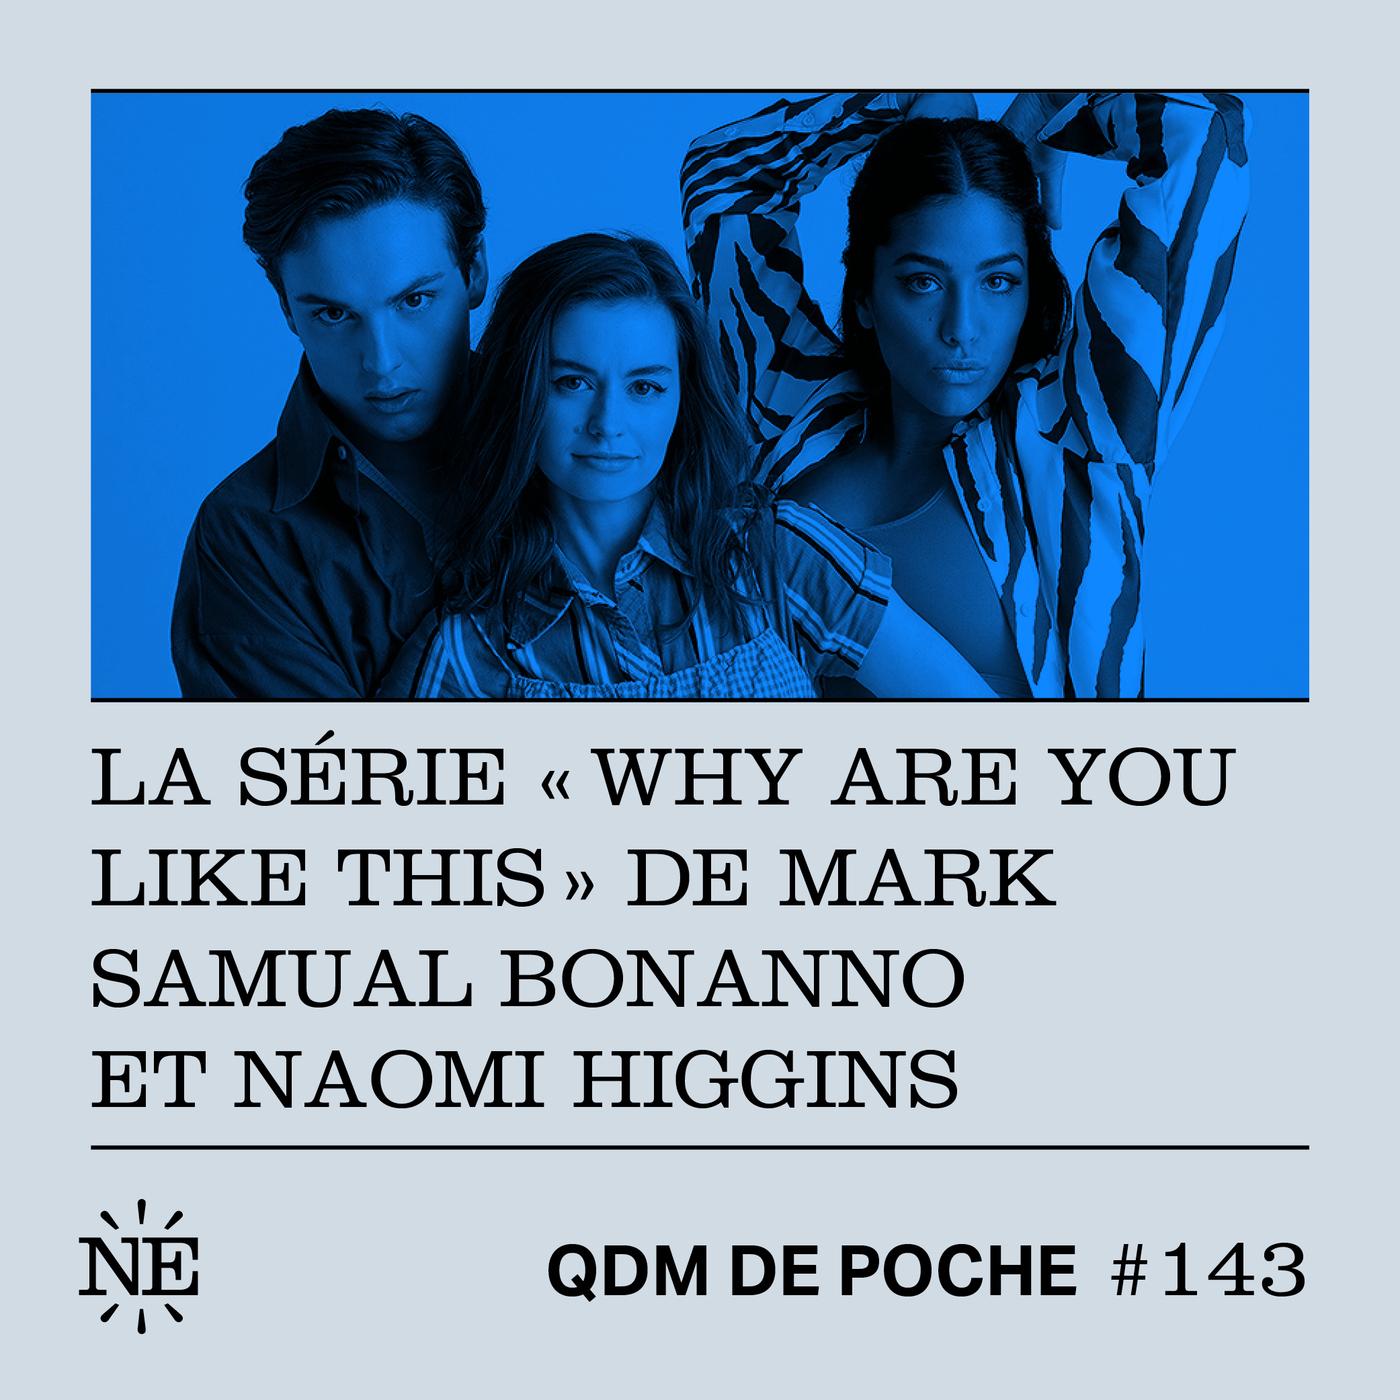 "#143 - QDM de Poche - La série ""Why are you like this"" de Mark Samual Bonanno et Naomi Higgins"